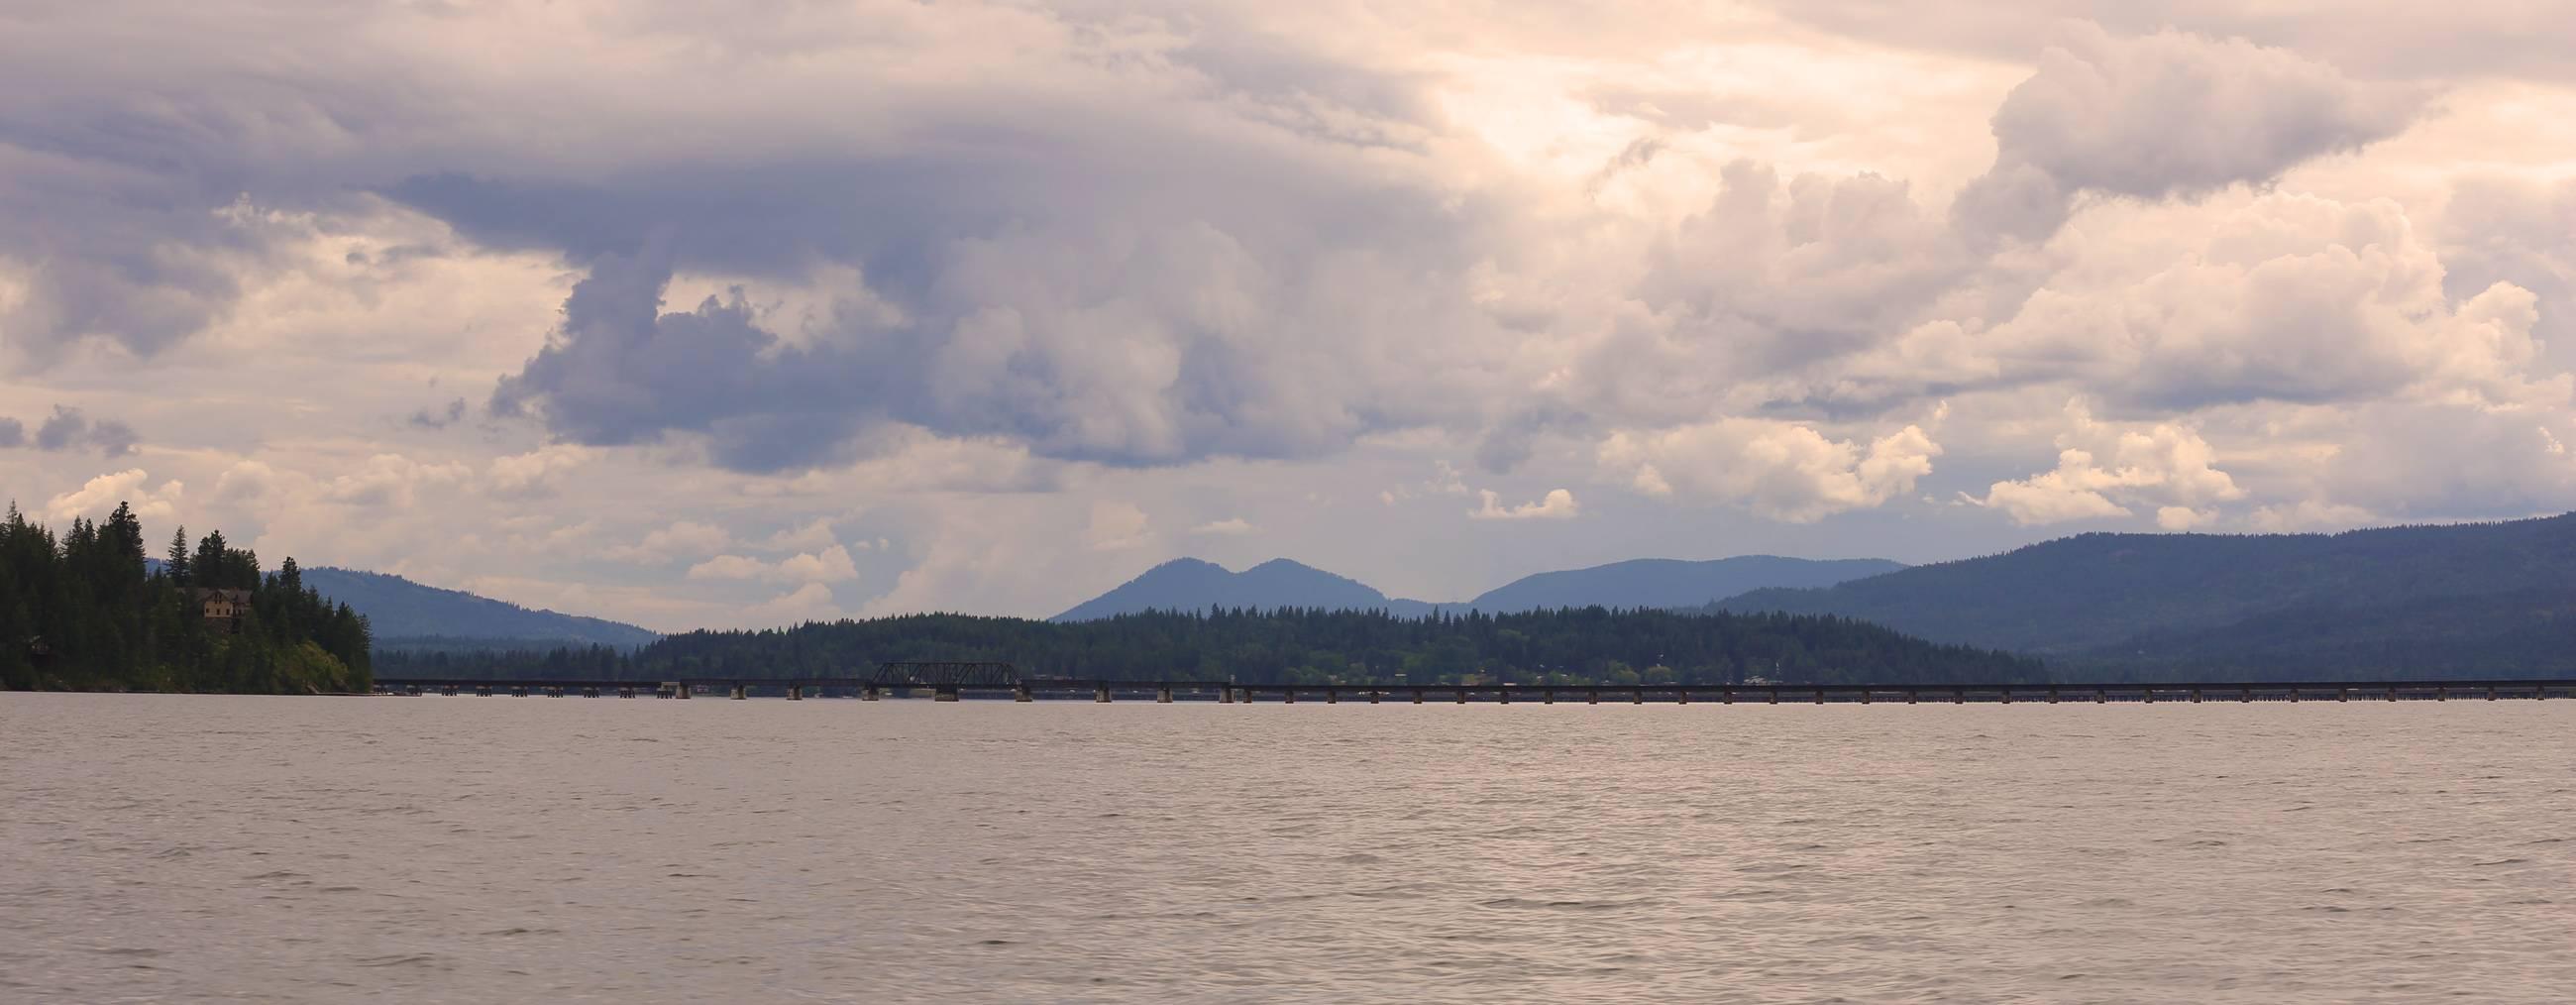 Lake Coeur d'Alene Scenic Byway | Visit Idaho